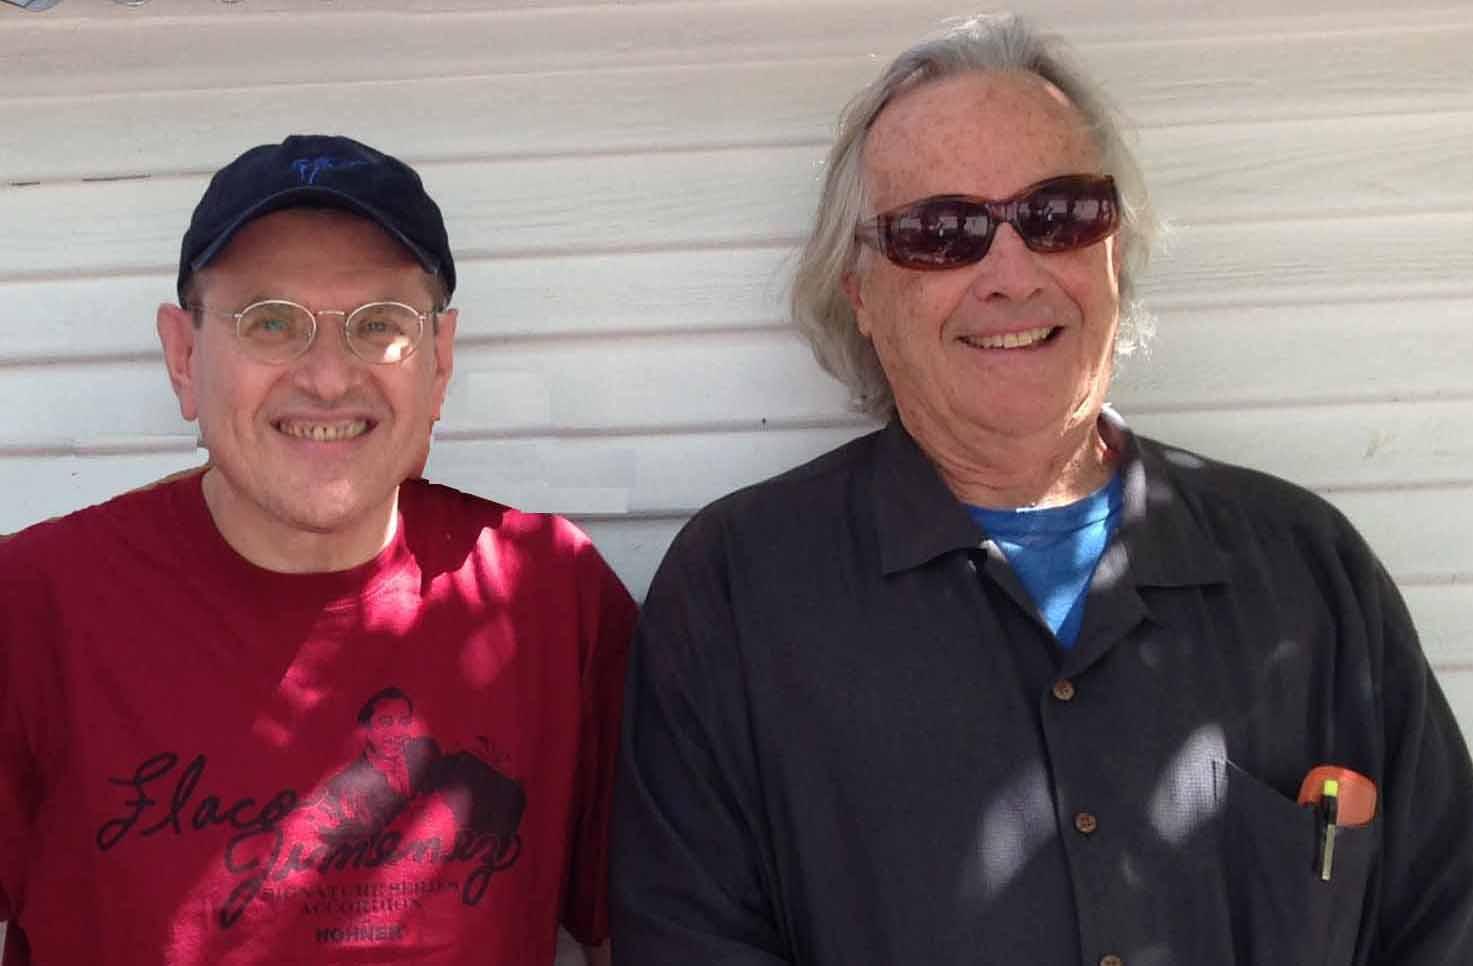 Fabrizio Poggi & Ry Cooder Texas 2015